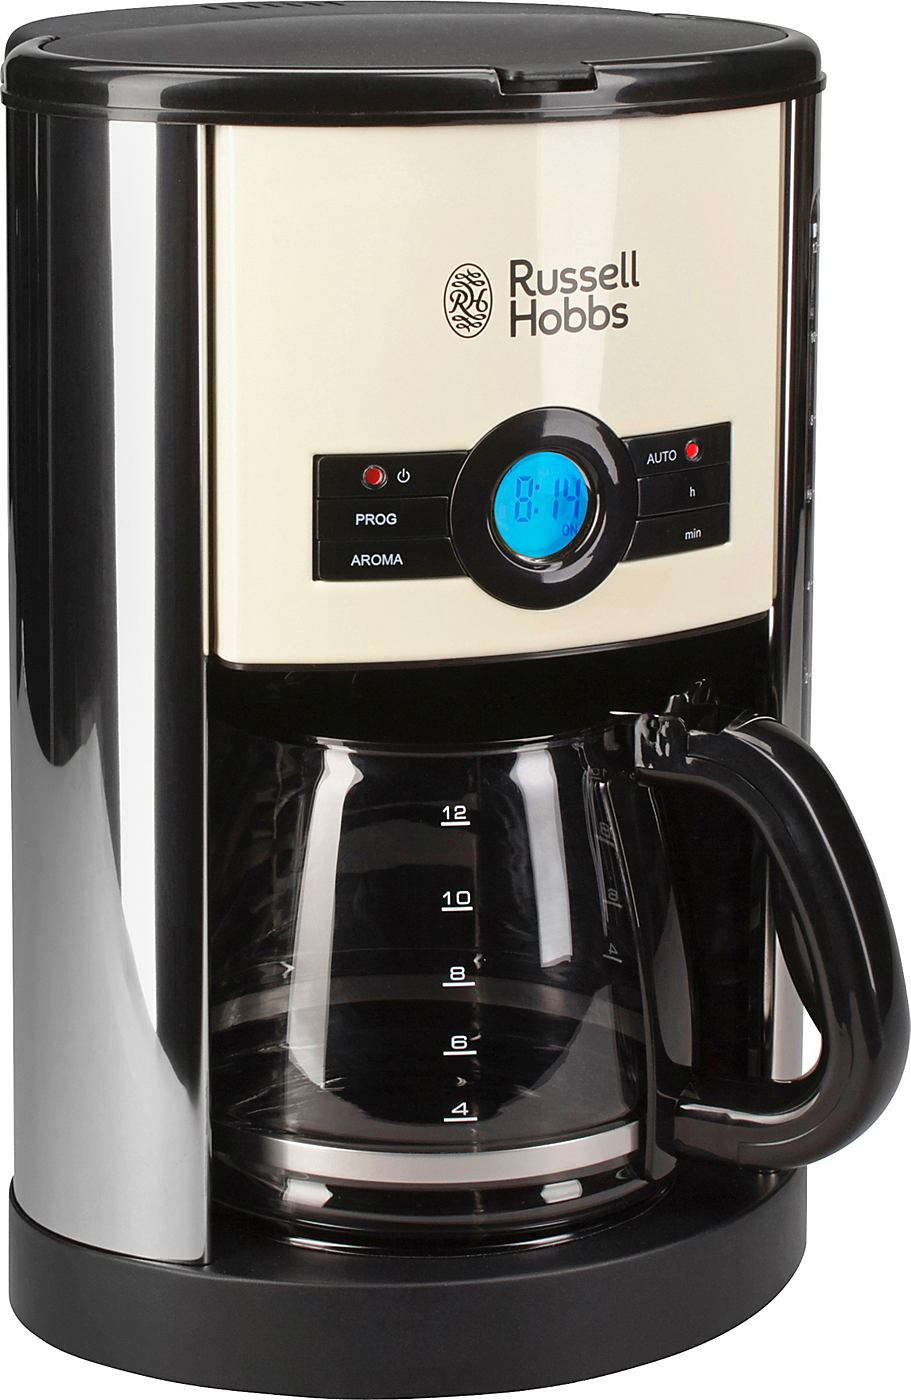 Russell Hobbs Glas-Kaffeemaschine »Cottage Creme« 18498-56